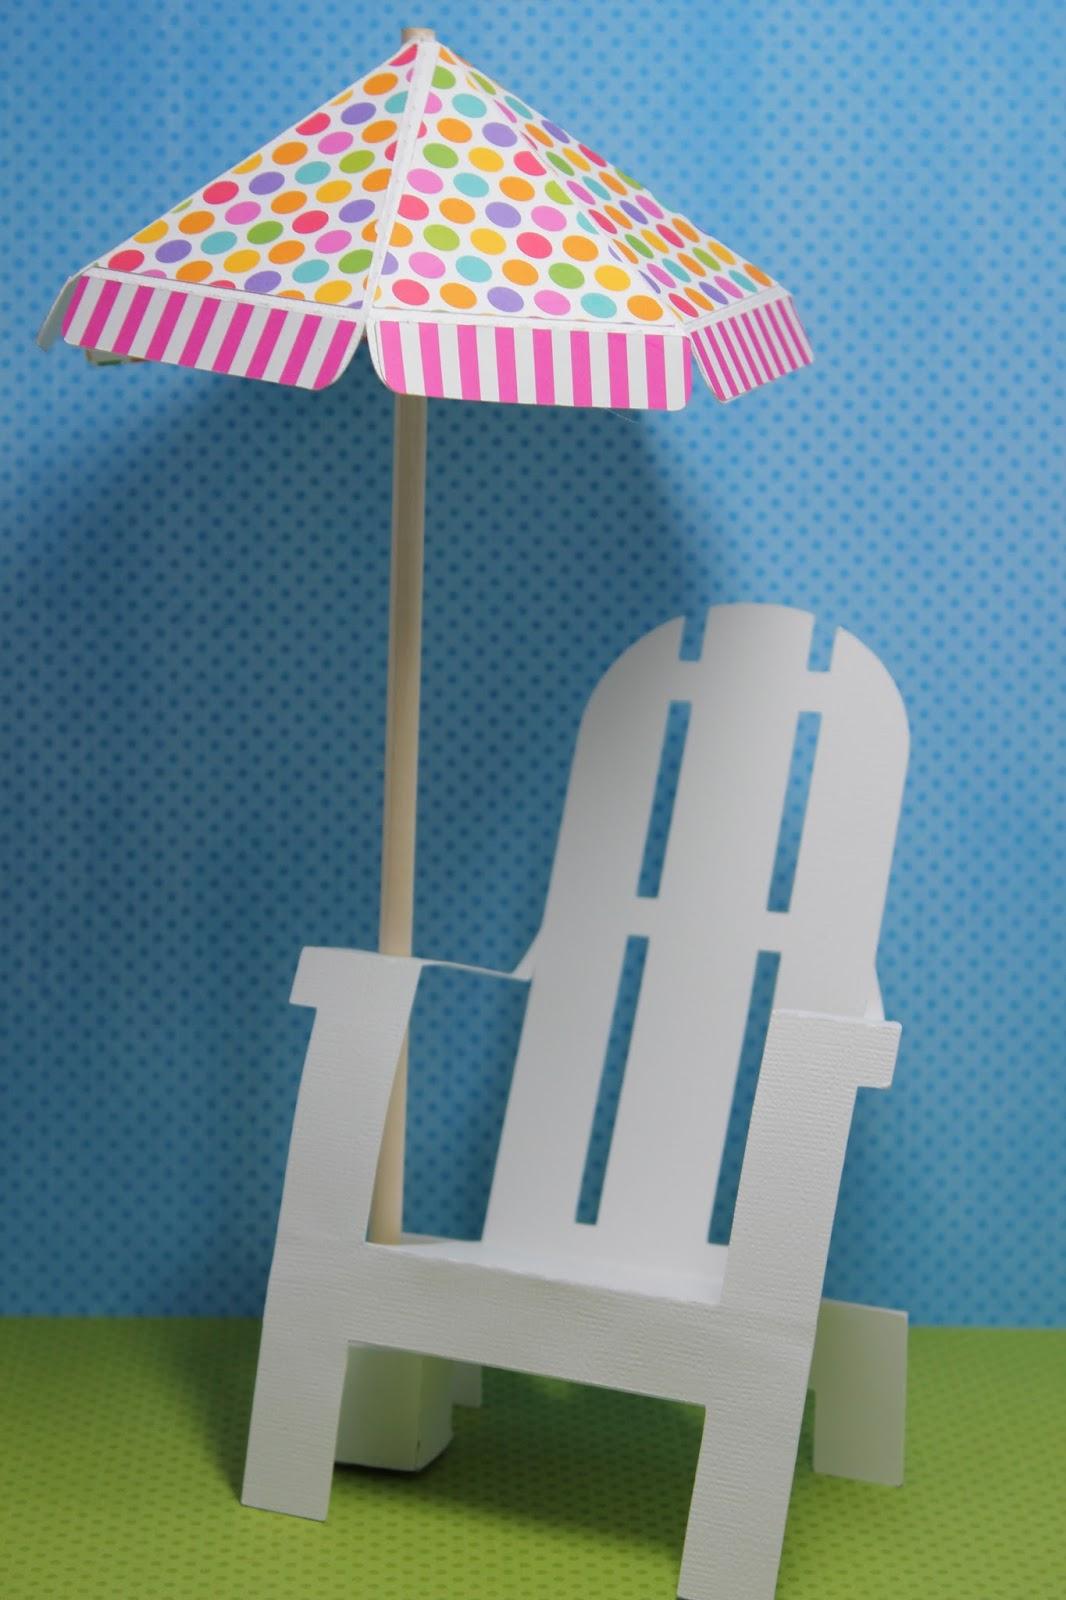 Svg Cutting Files Adirondack Chair And Umbrella